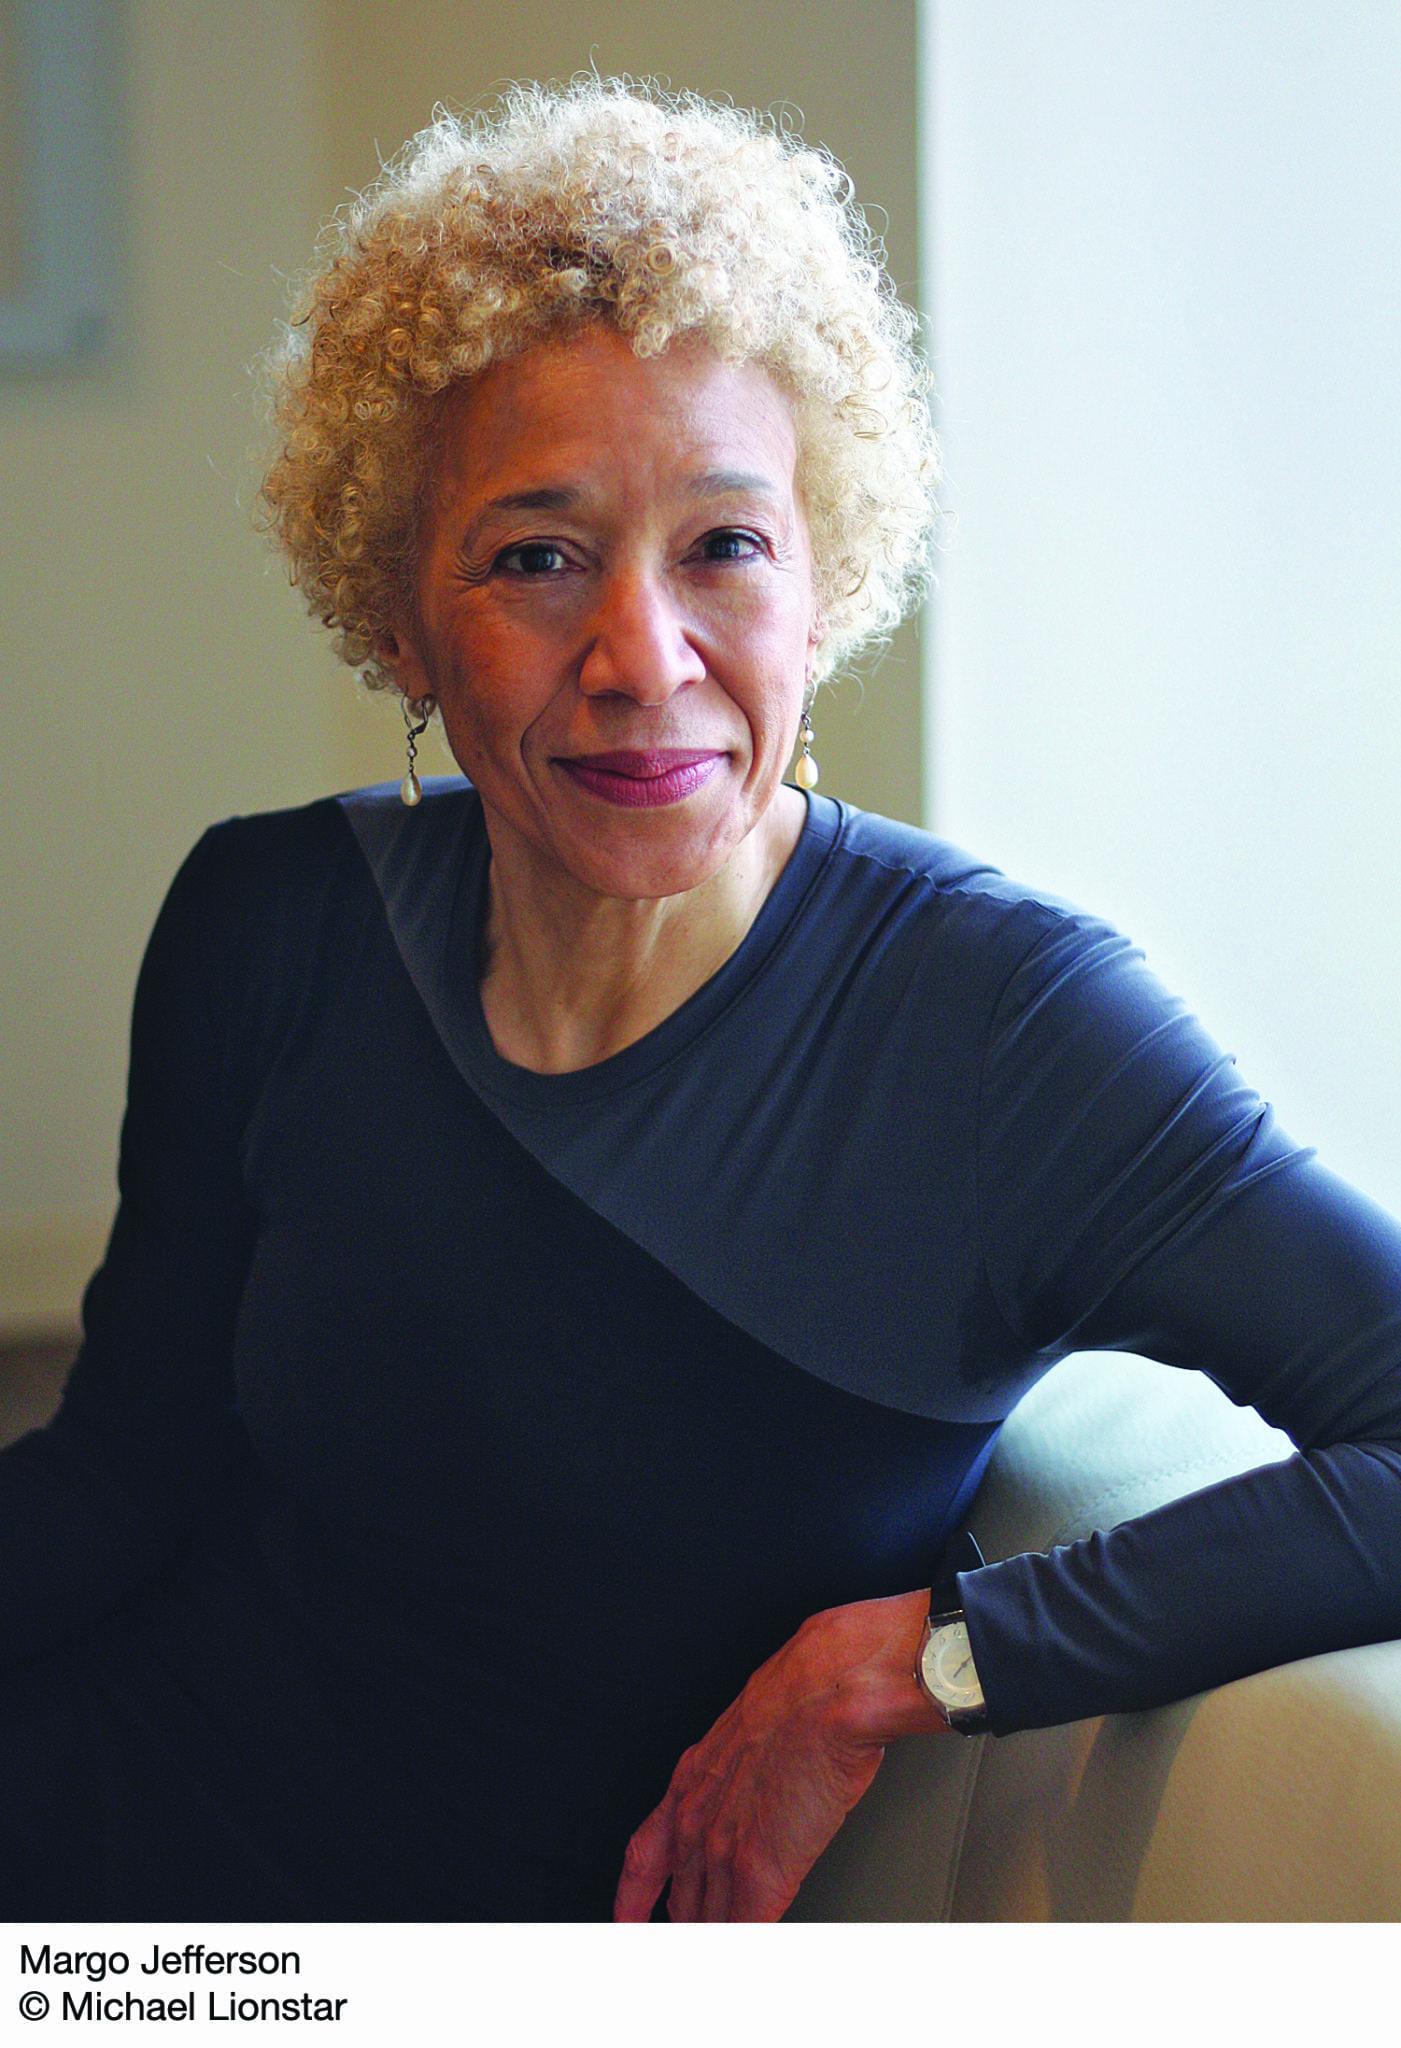 Margo Jefferson. Image by Michael Lionstar, courtesy Penguin.